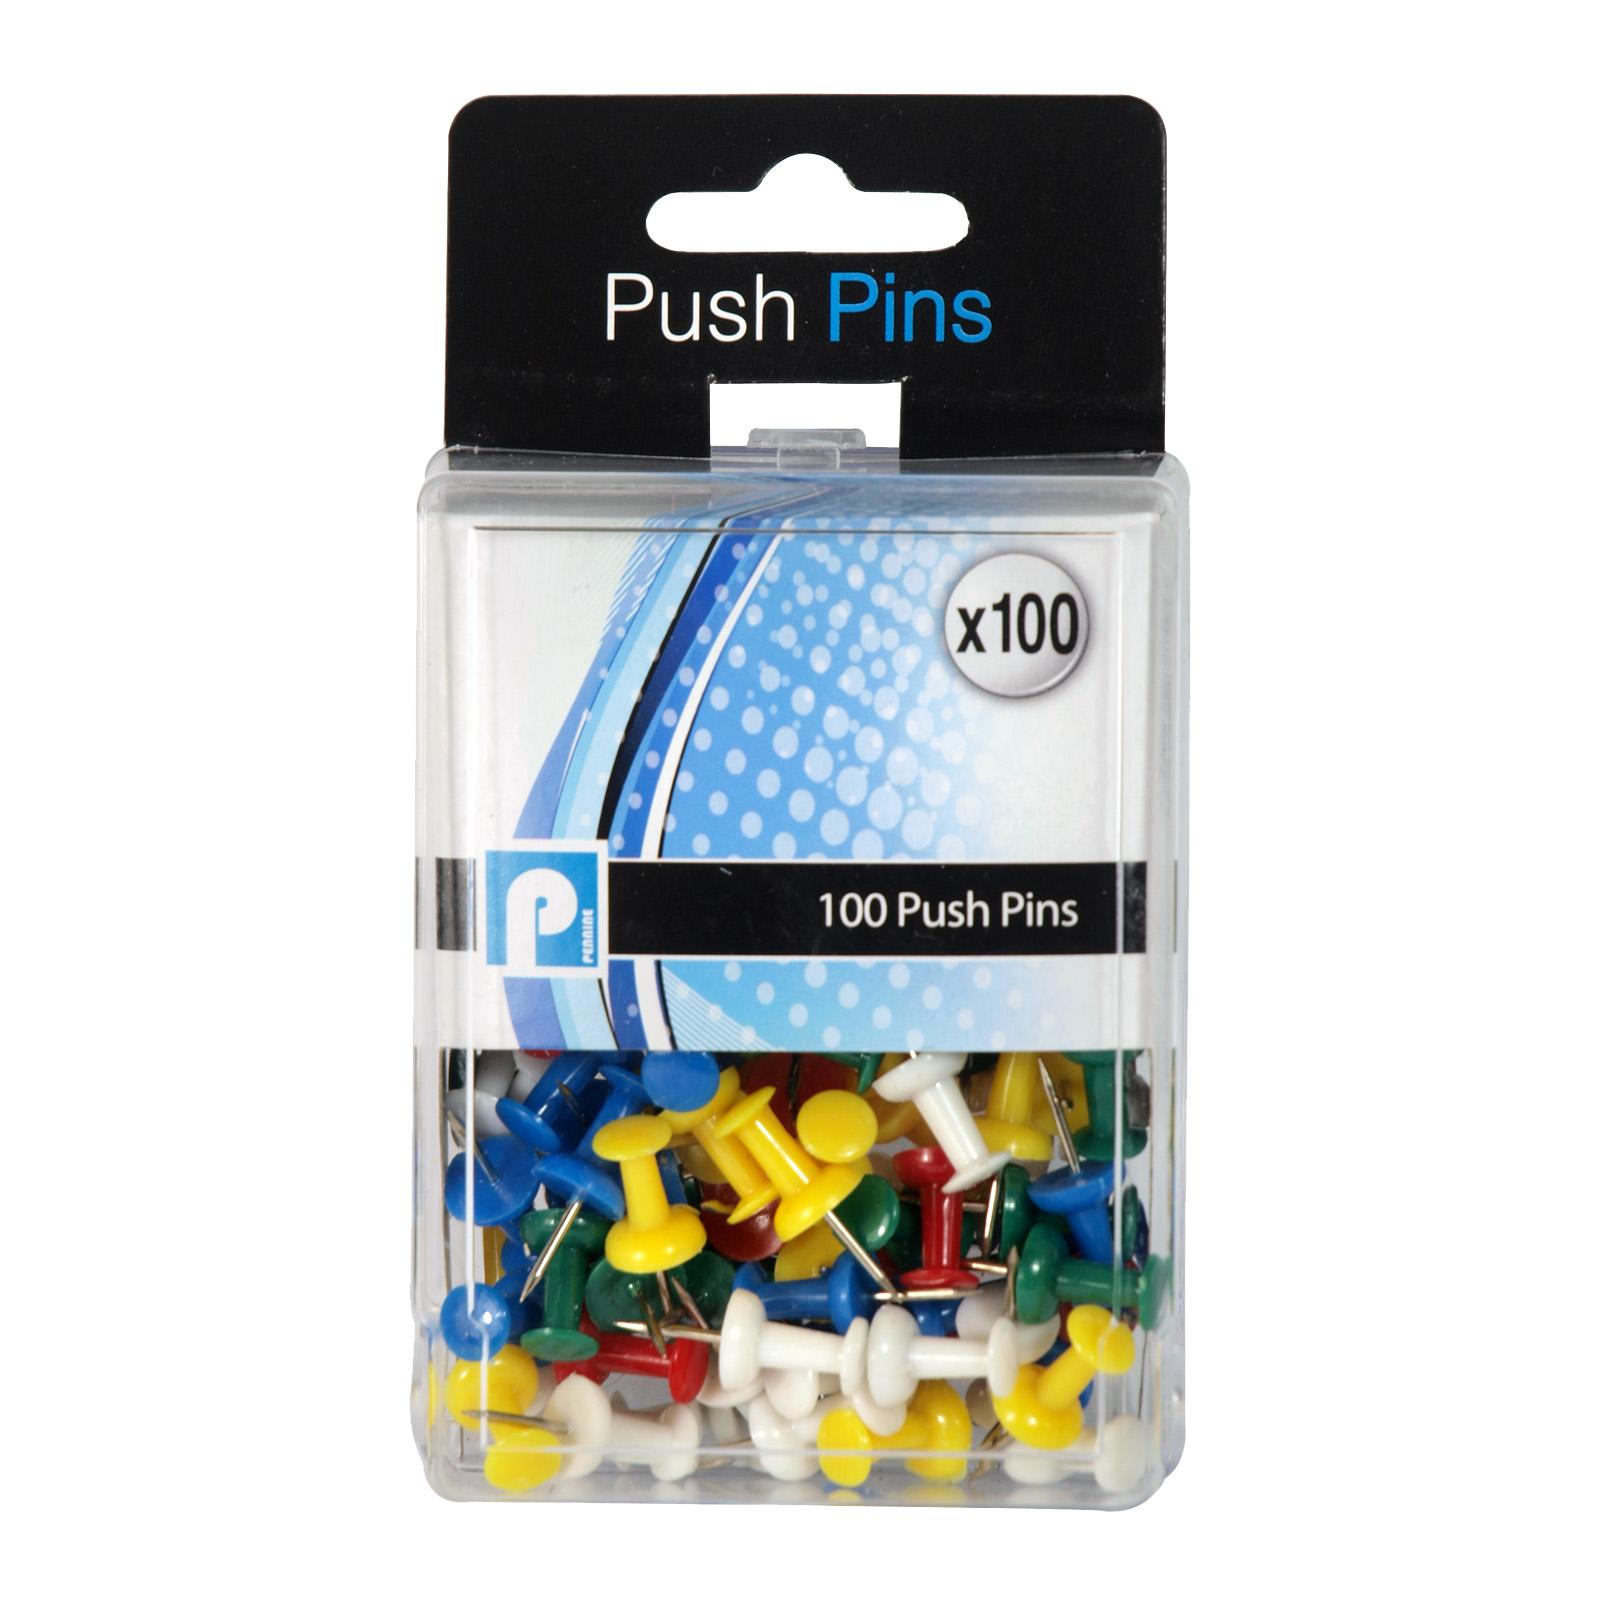 PENNINE 100 PUSH PINS X12